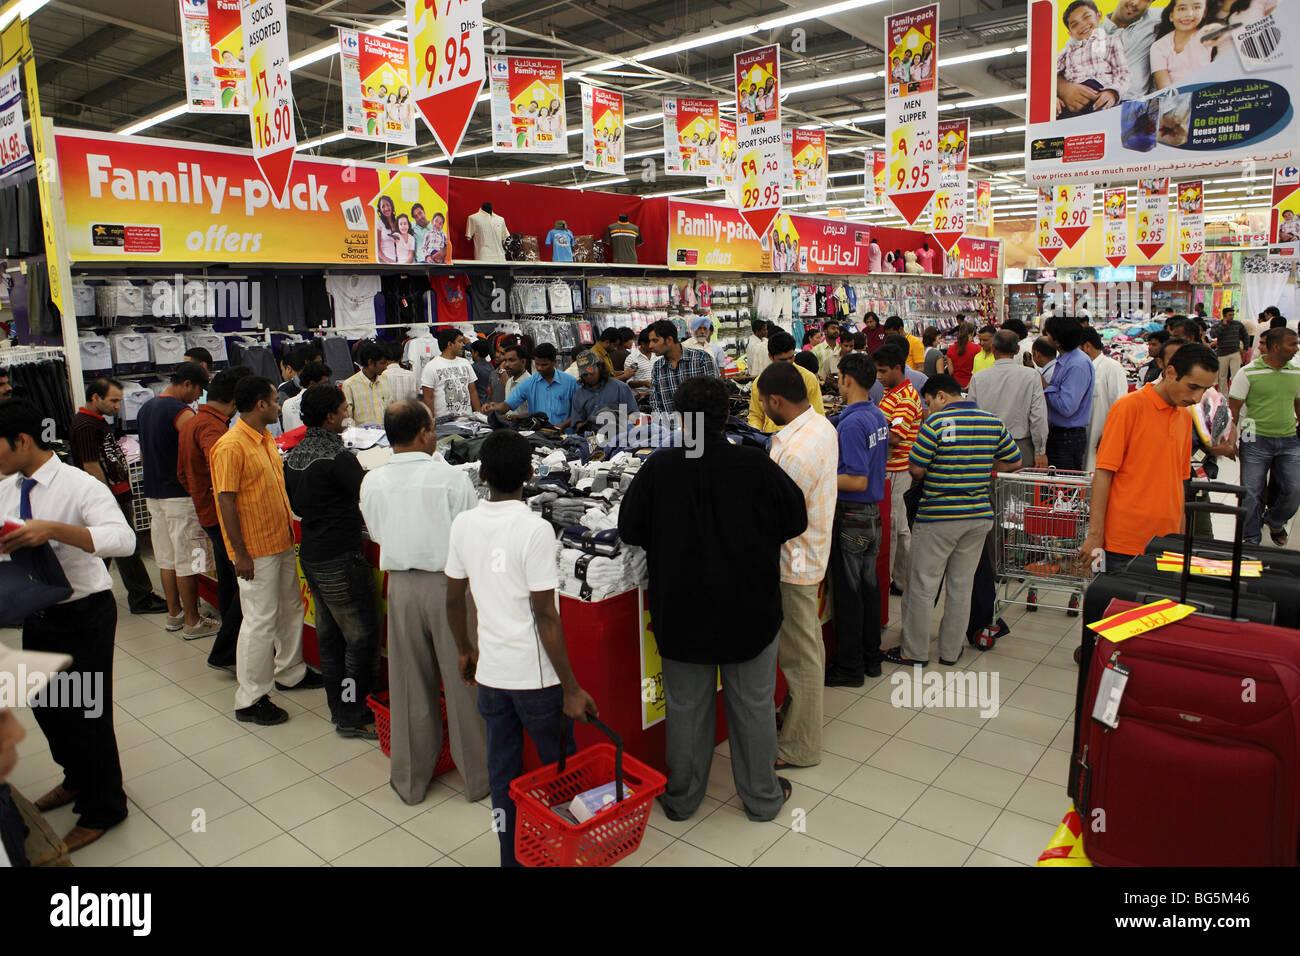 Clients in Carrefour, Dubai, United Arab Emirates - Stock Image